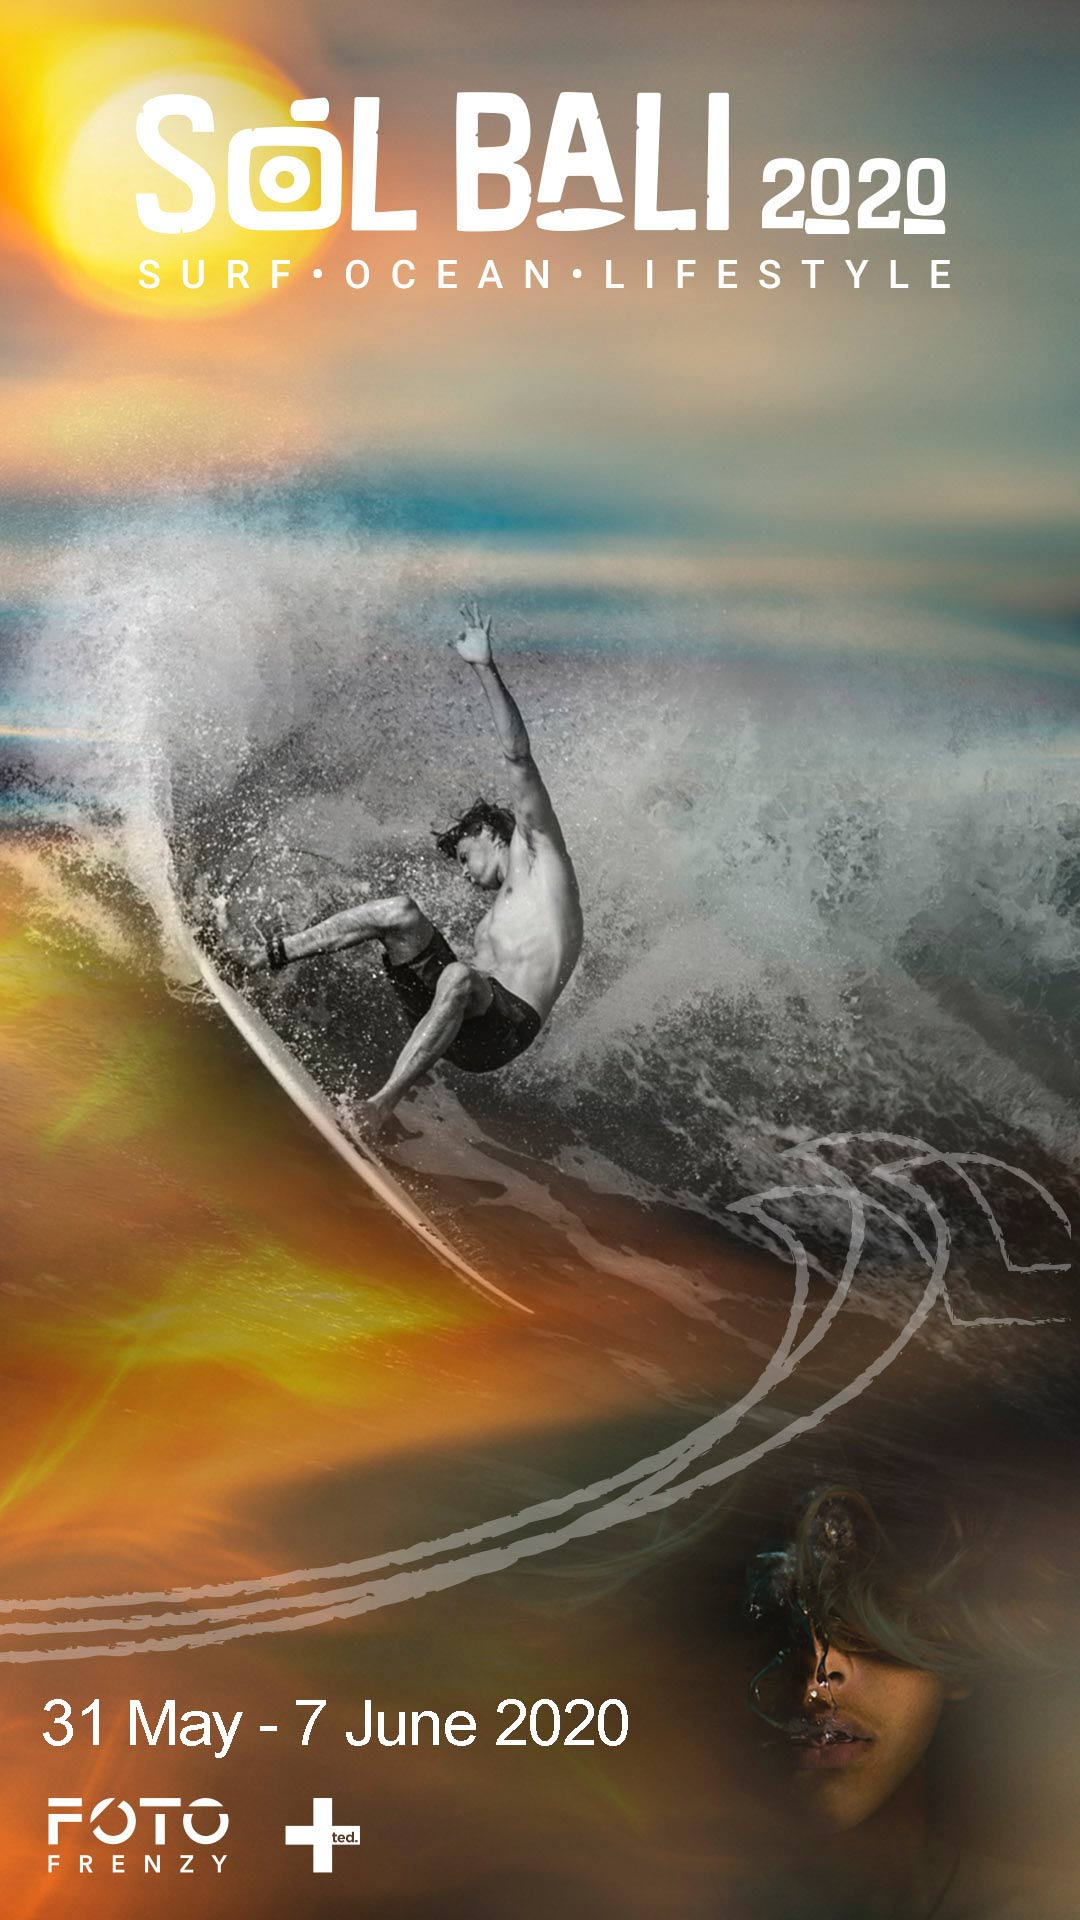 Surf Ocean Photography Workshop